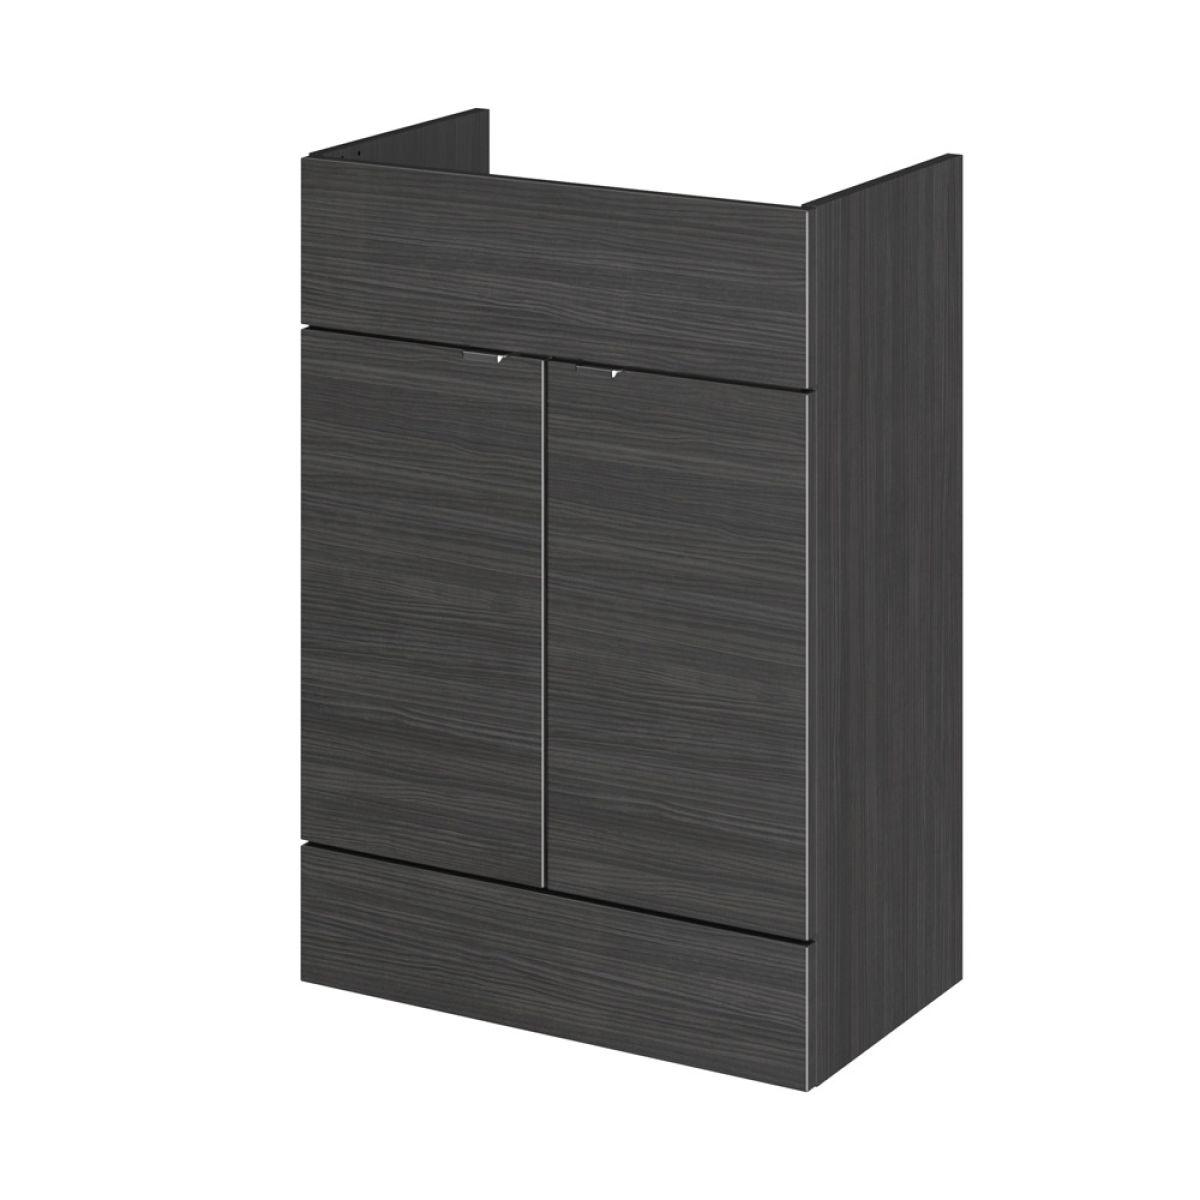 Hudson Reed Fusion Hacienda Black Full Depth Storage Furniture Pack 1500mm